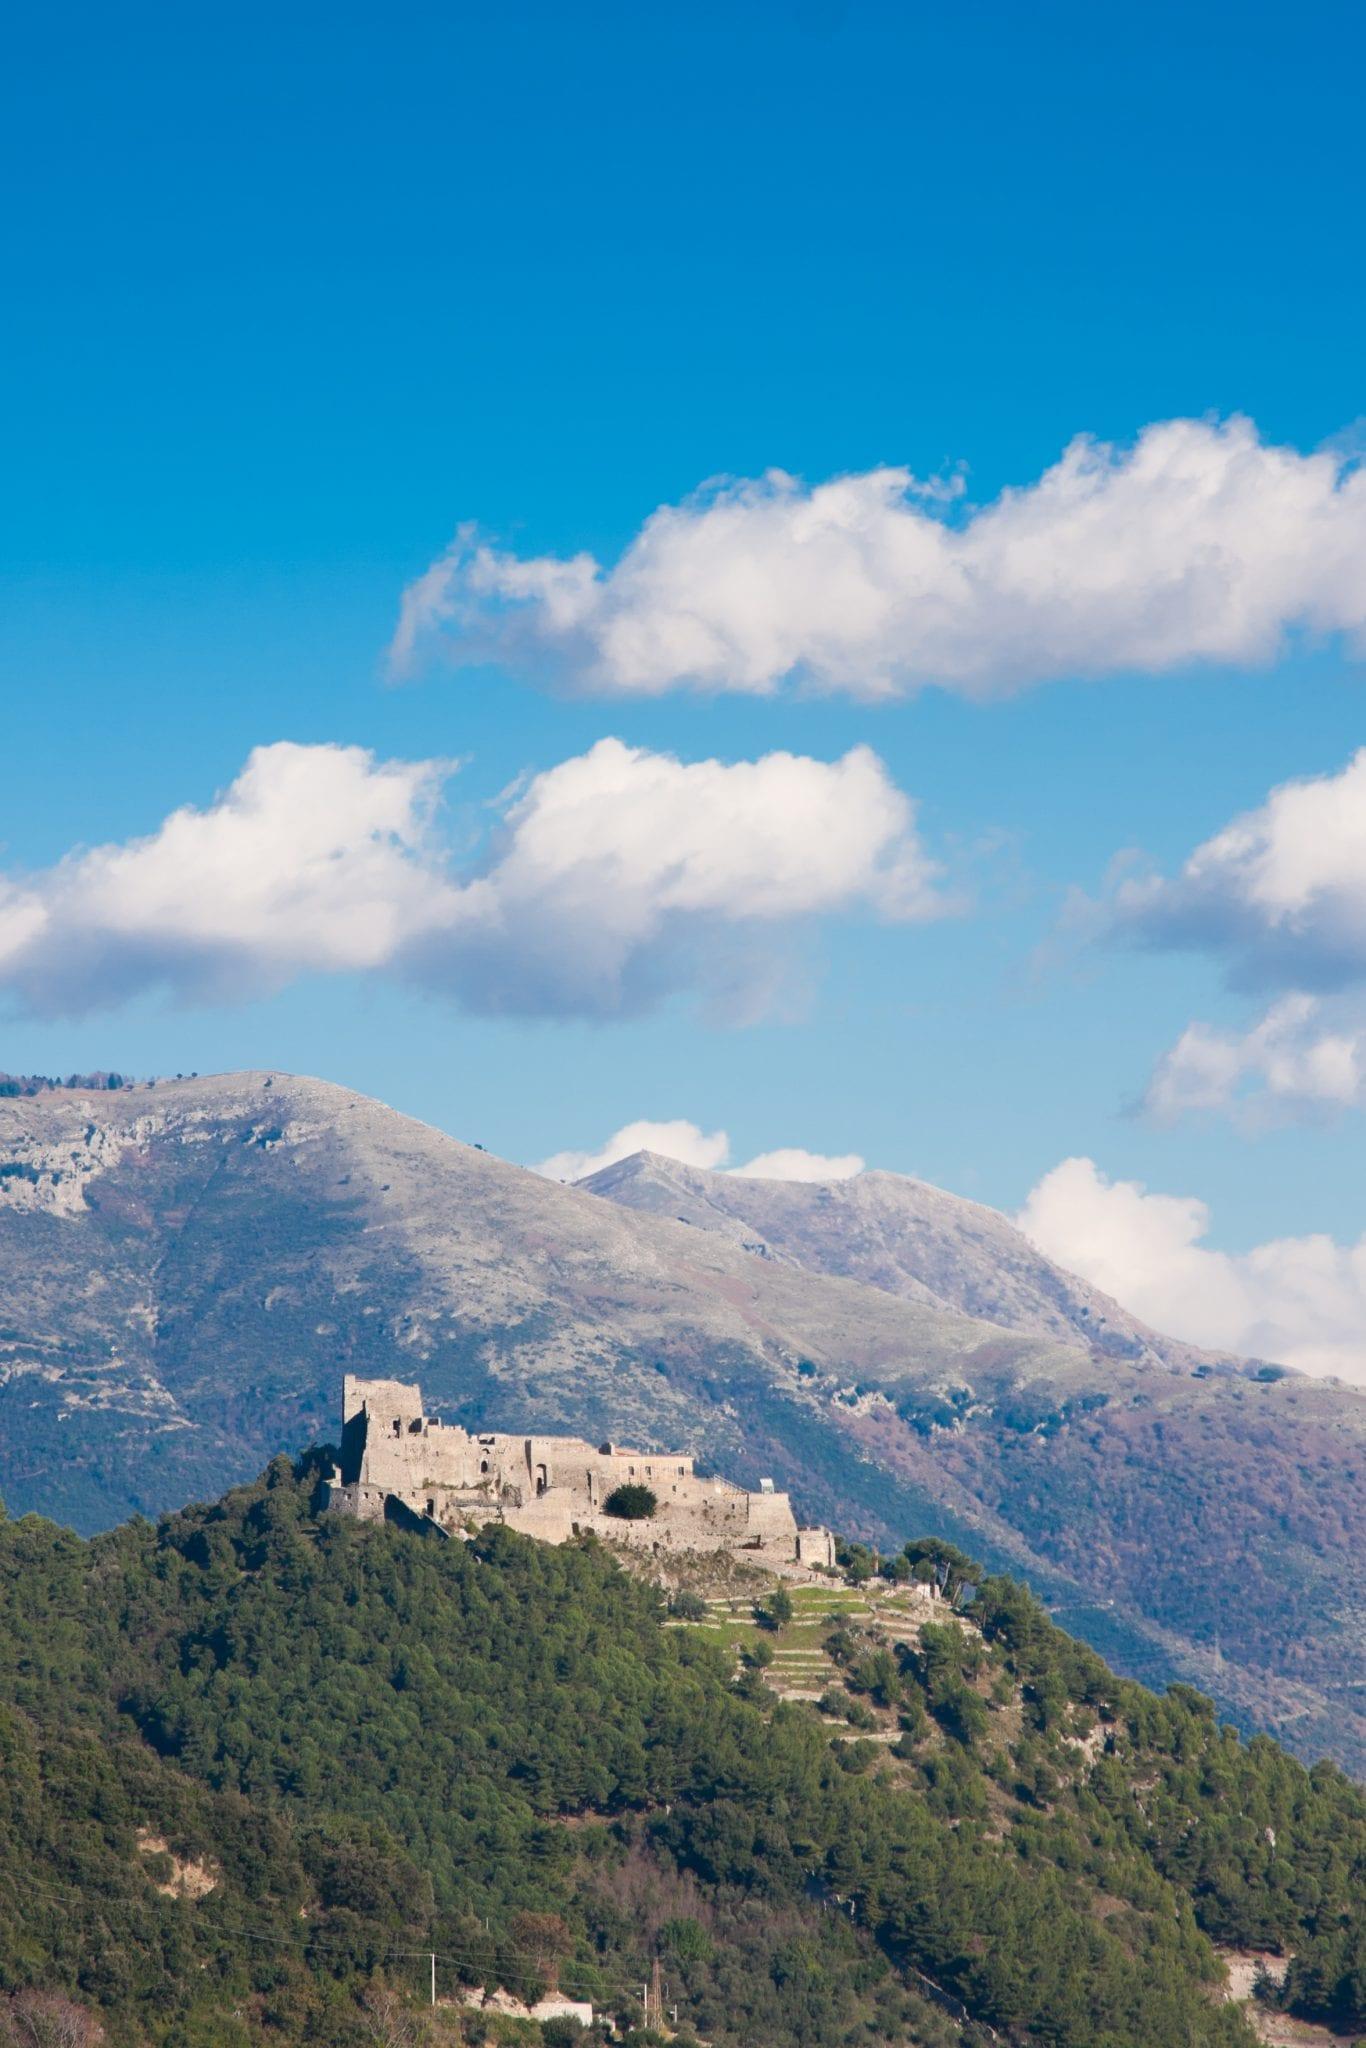 Castle in Salerno on the Amalfi coast, Italy